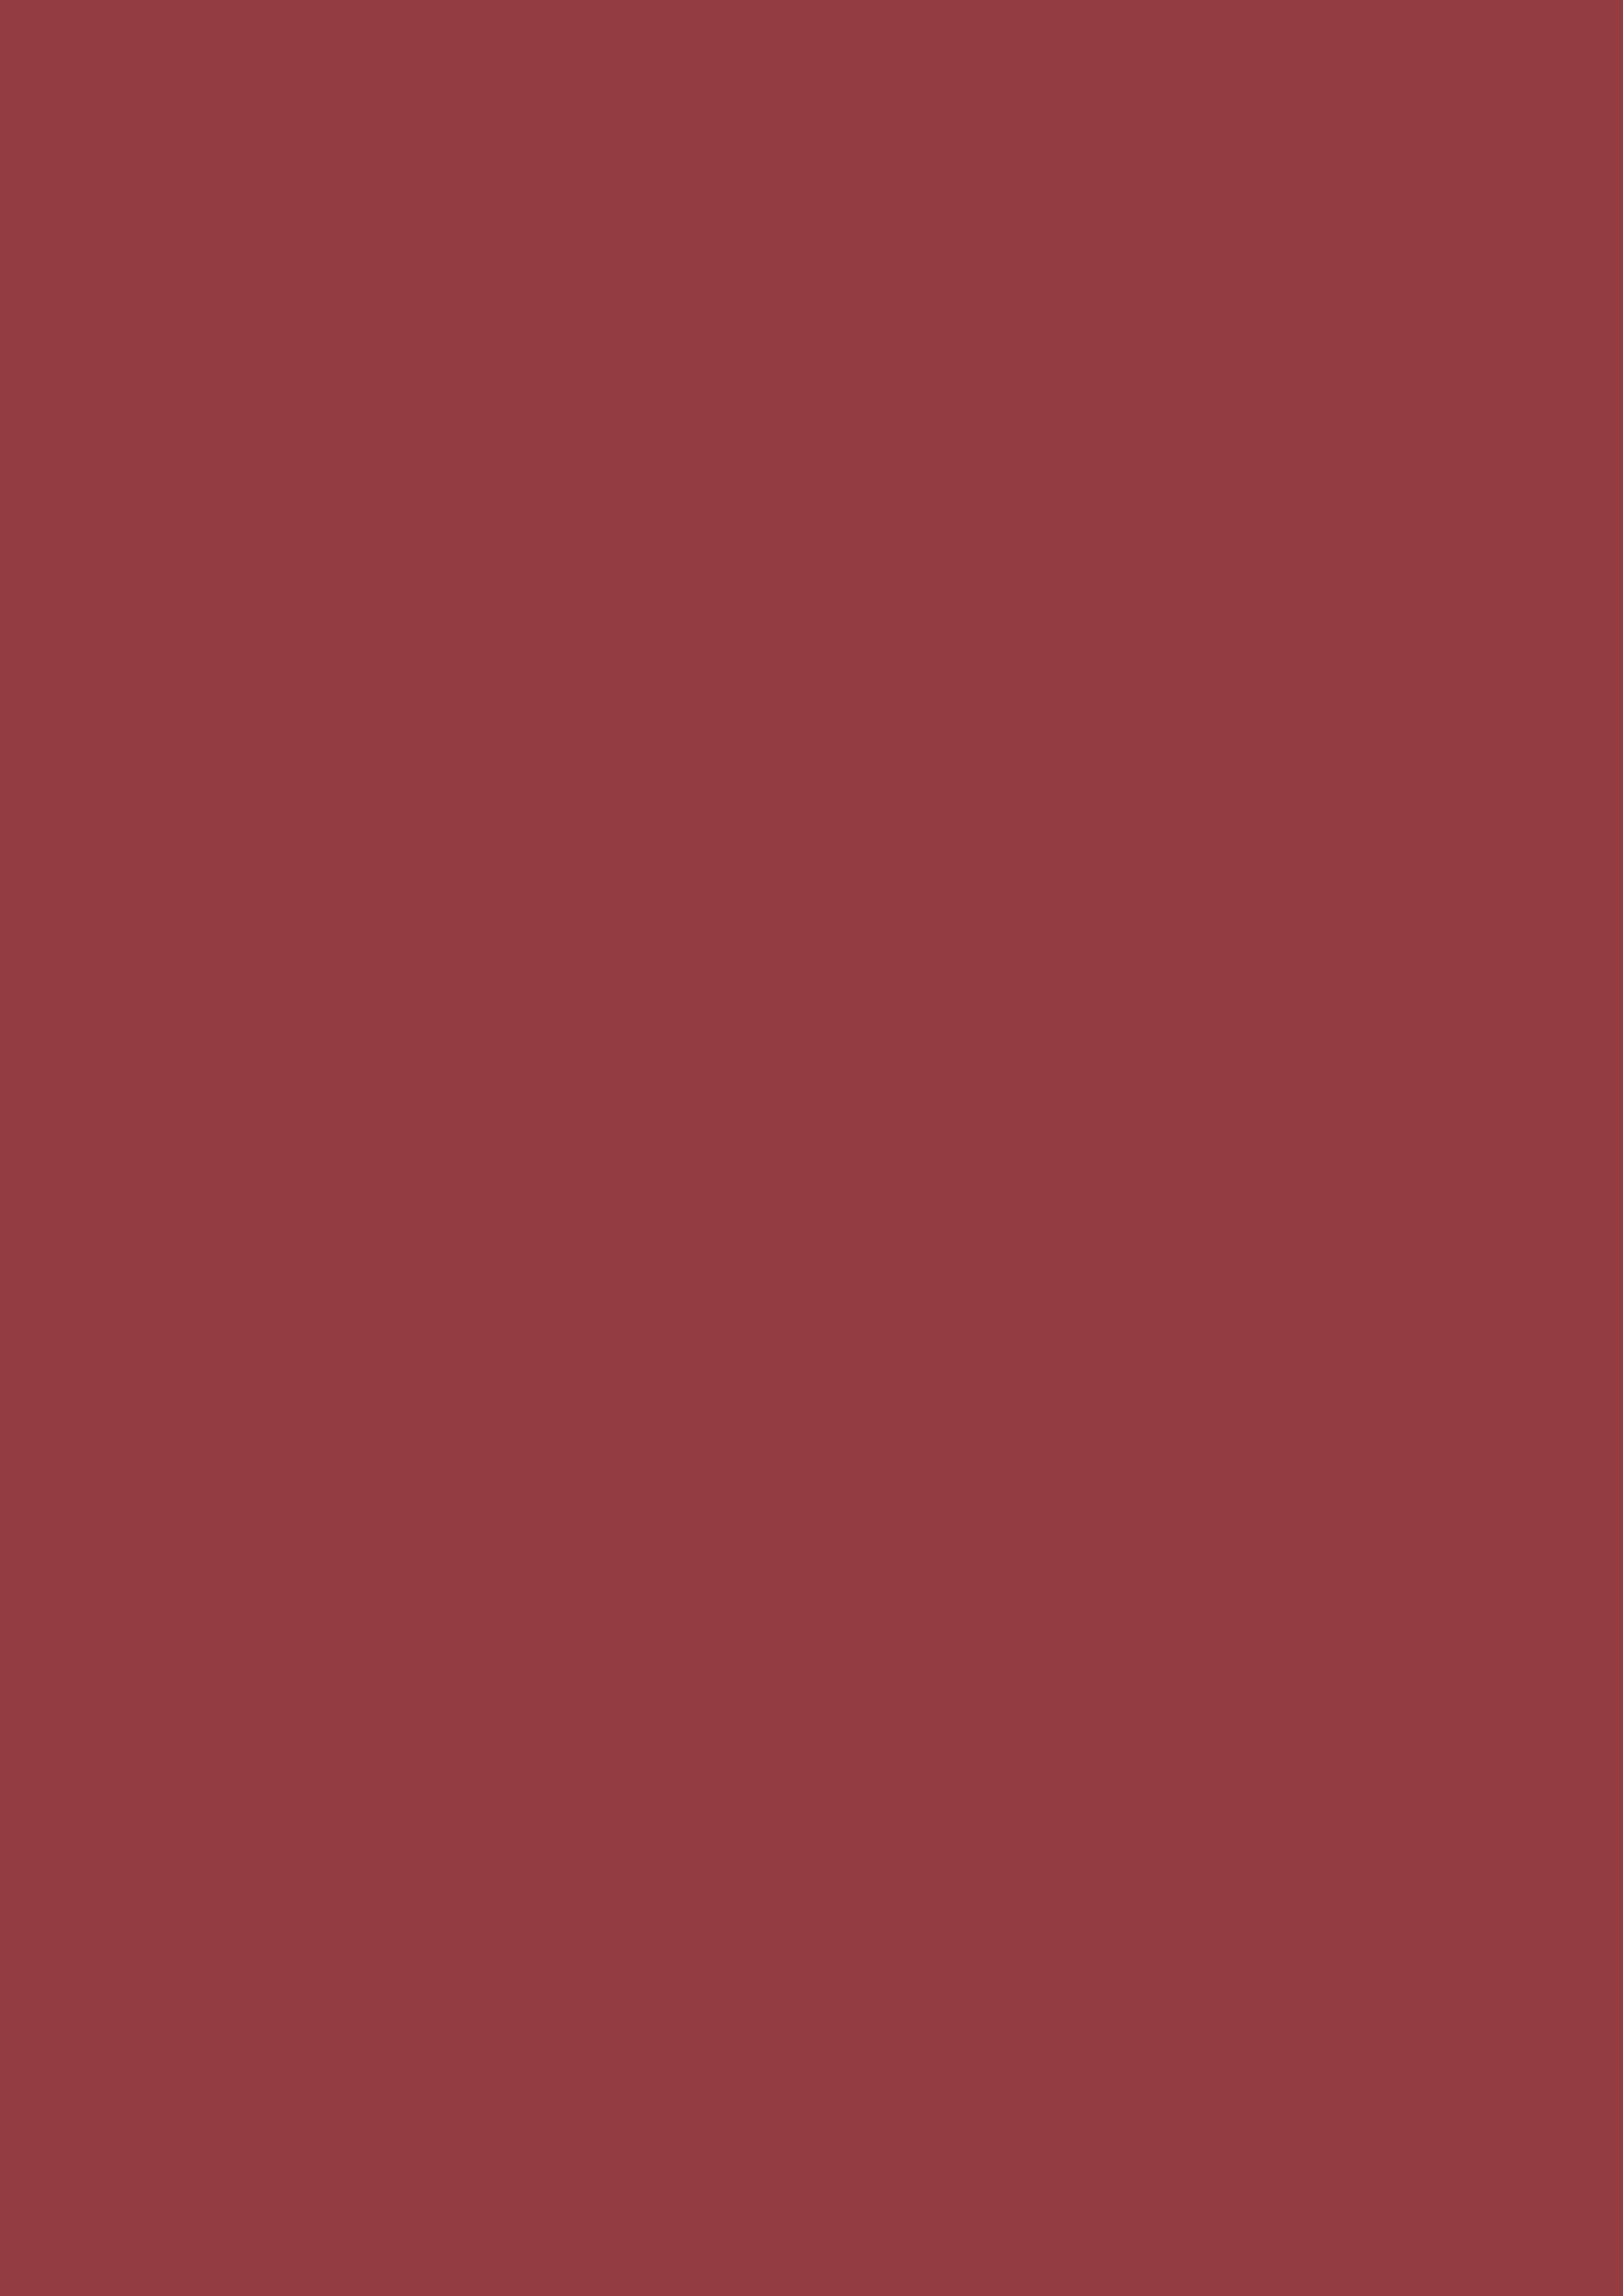 2480x3508 Smokey Topaz Solid Color Background